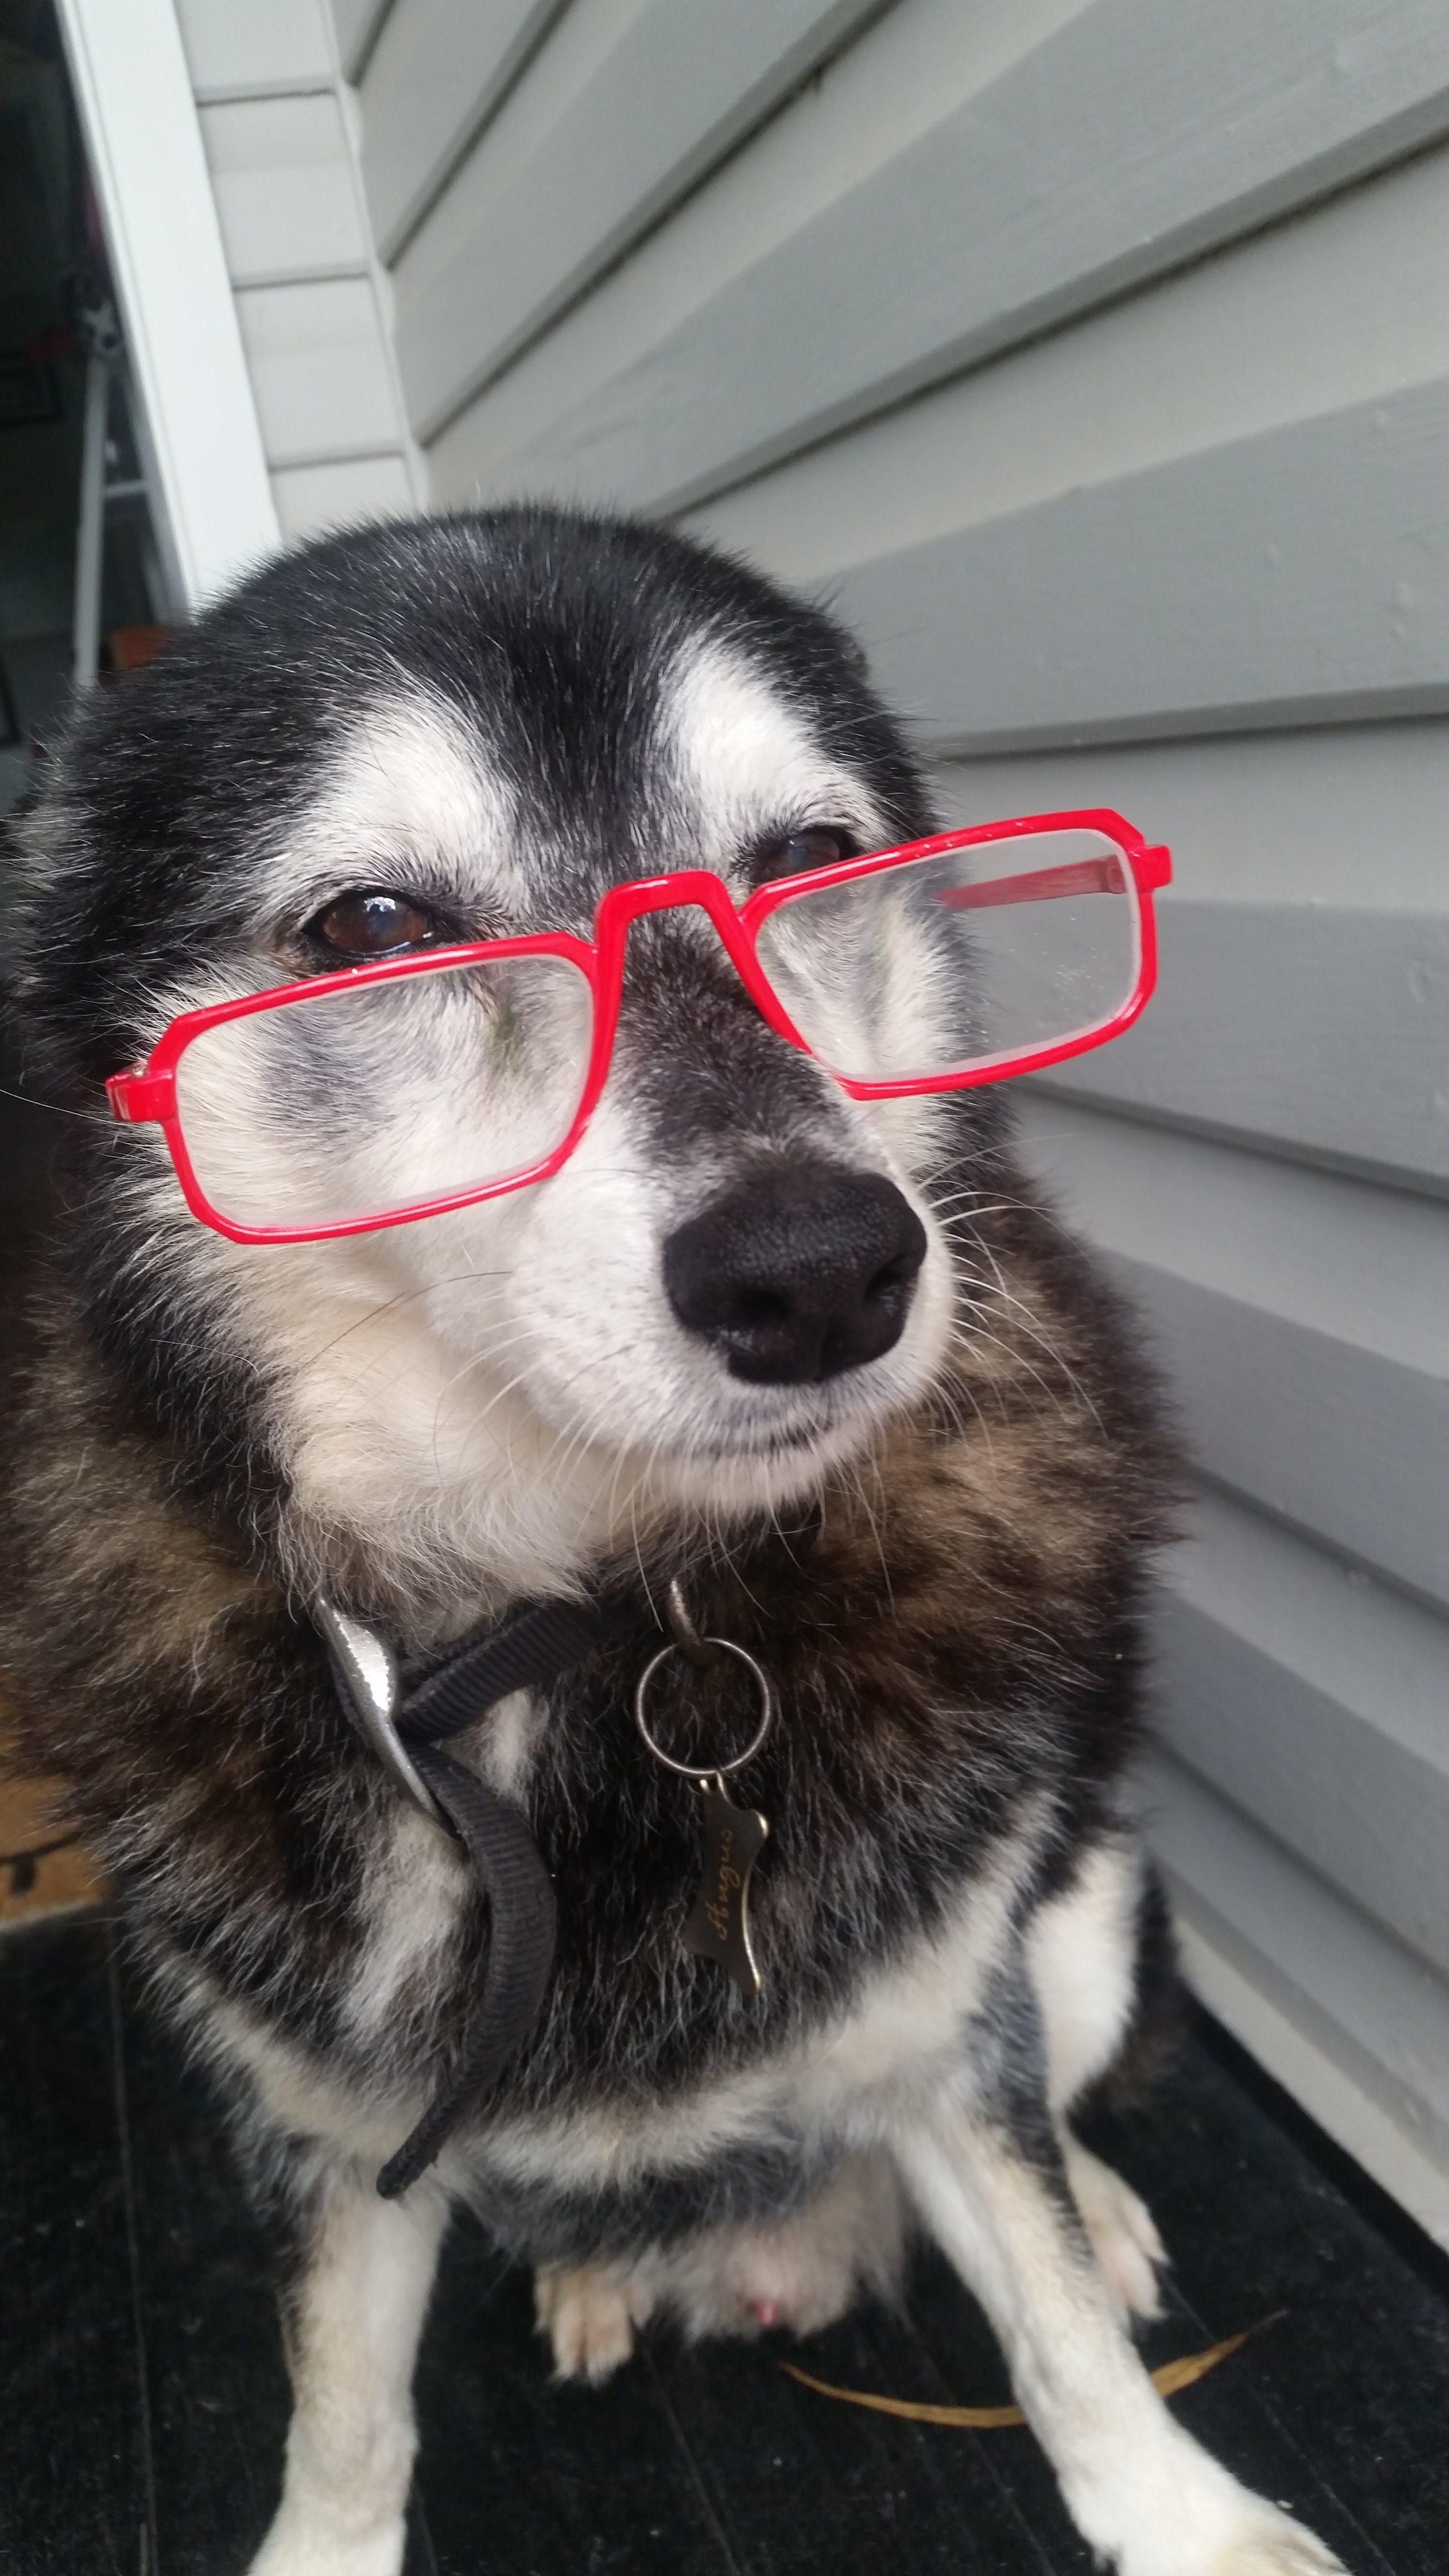 Free stock photo of dog, cute, animals, domestic animal